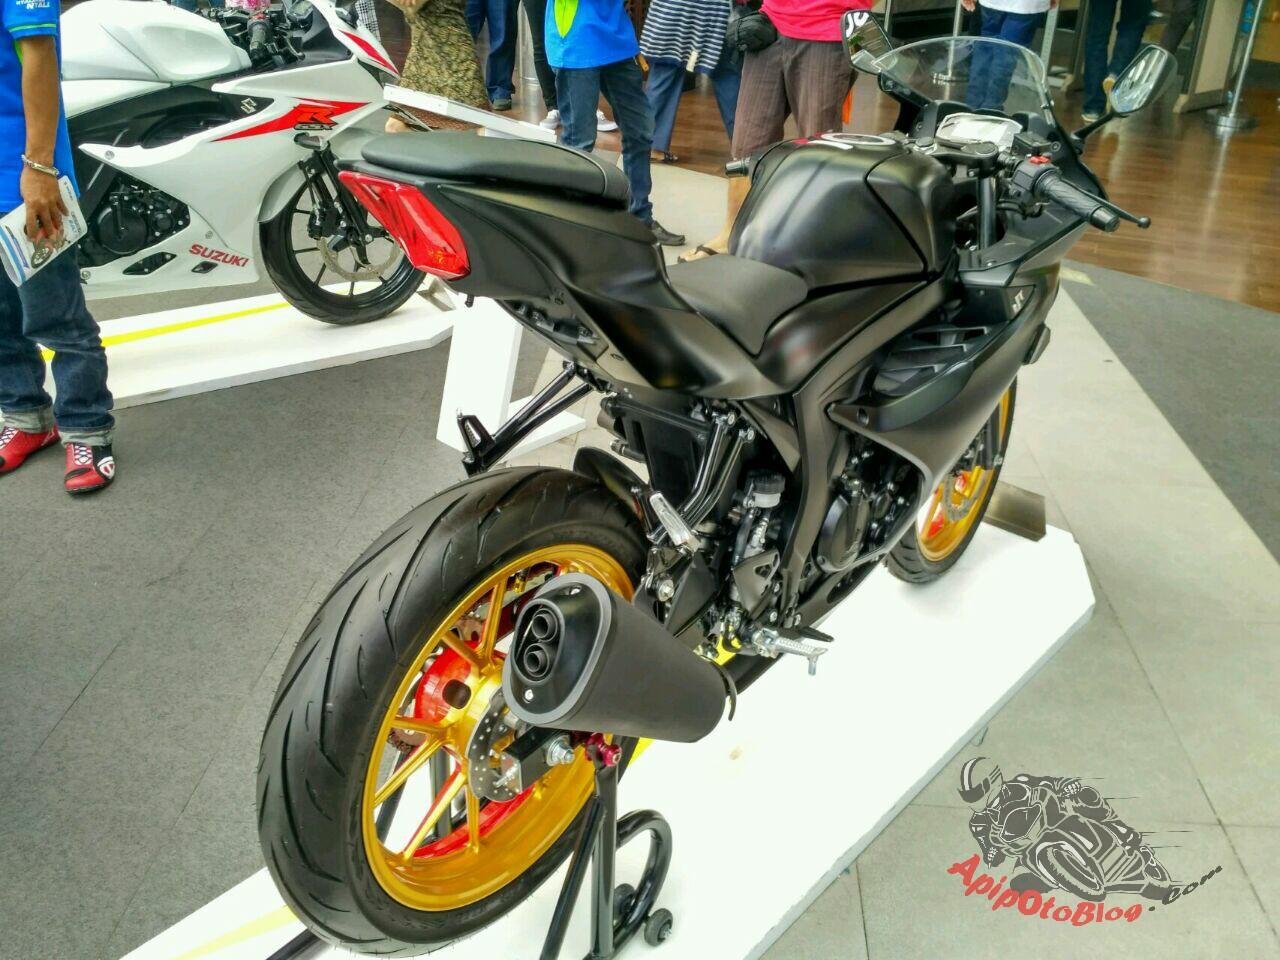 71 Gambar Modifikasi Motor Gsx R150 Terunik Kakashi Modifikasi